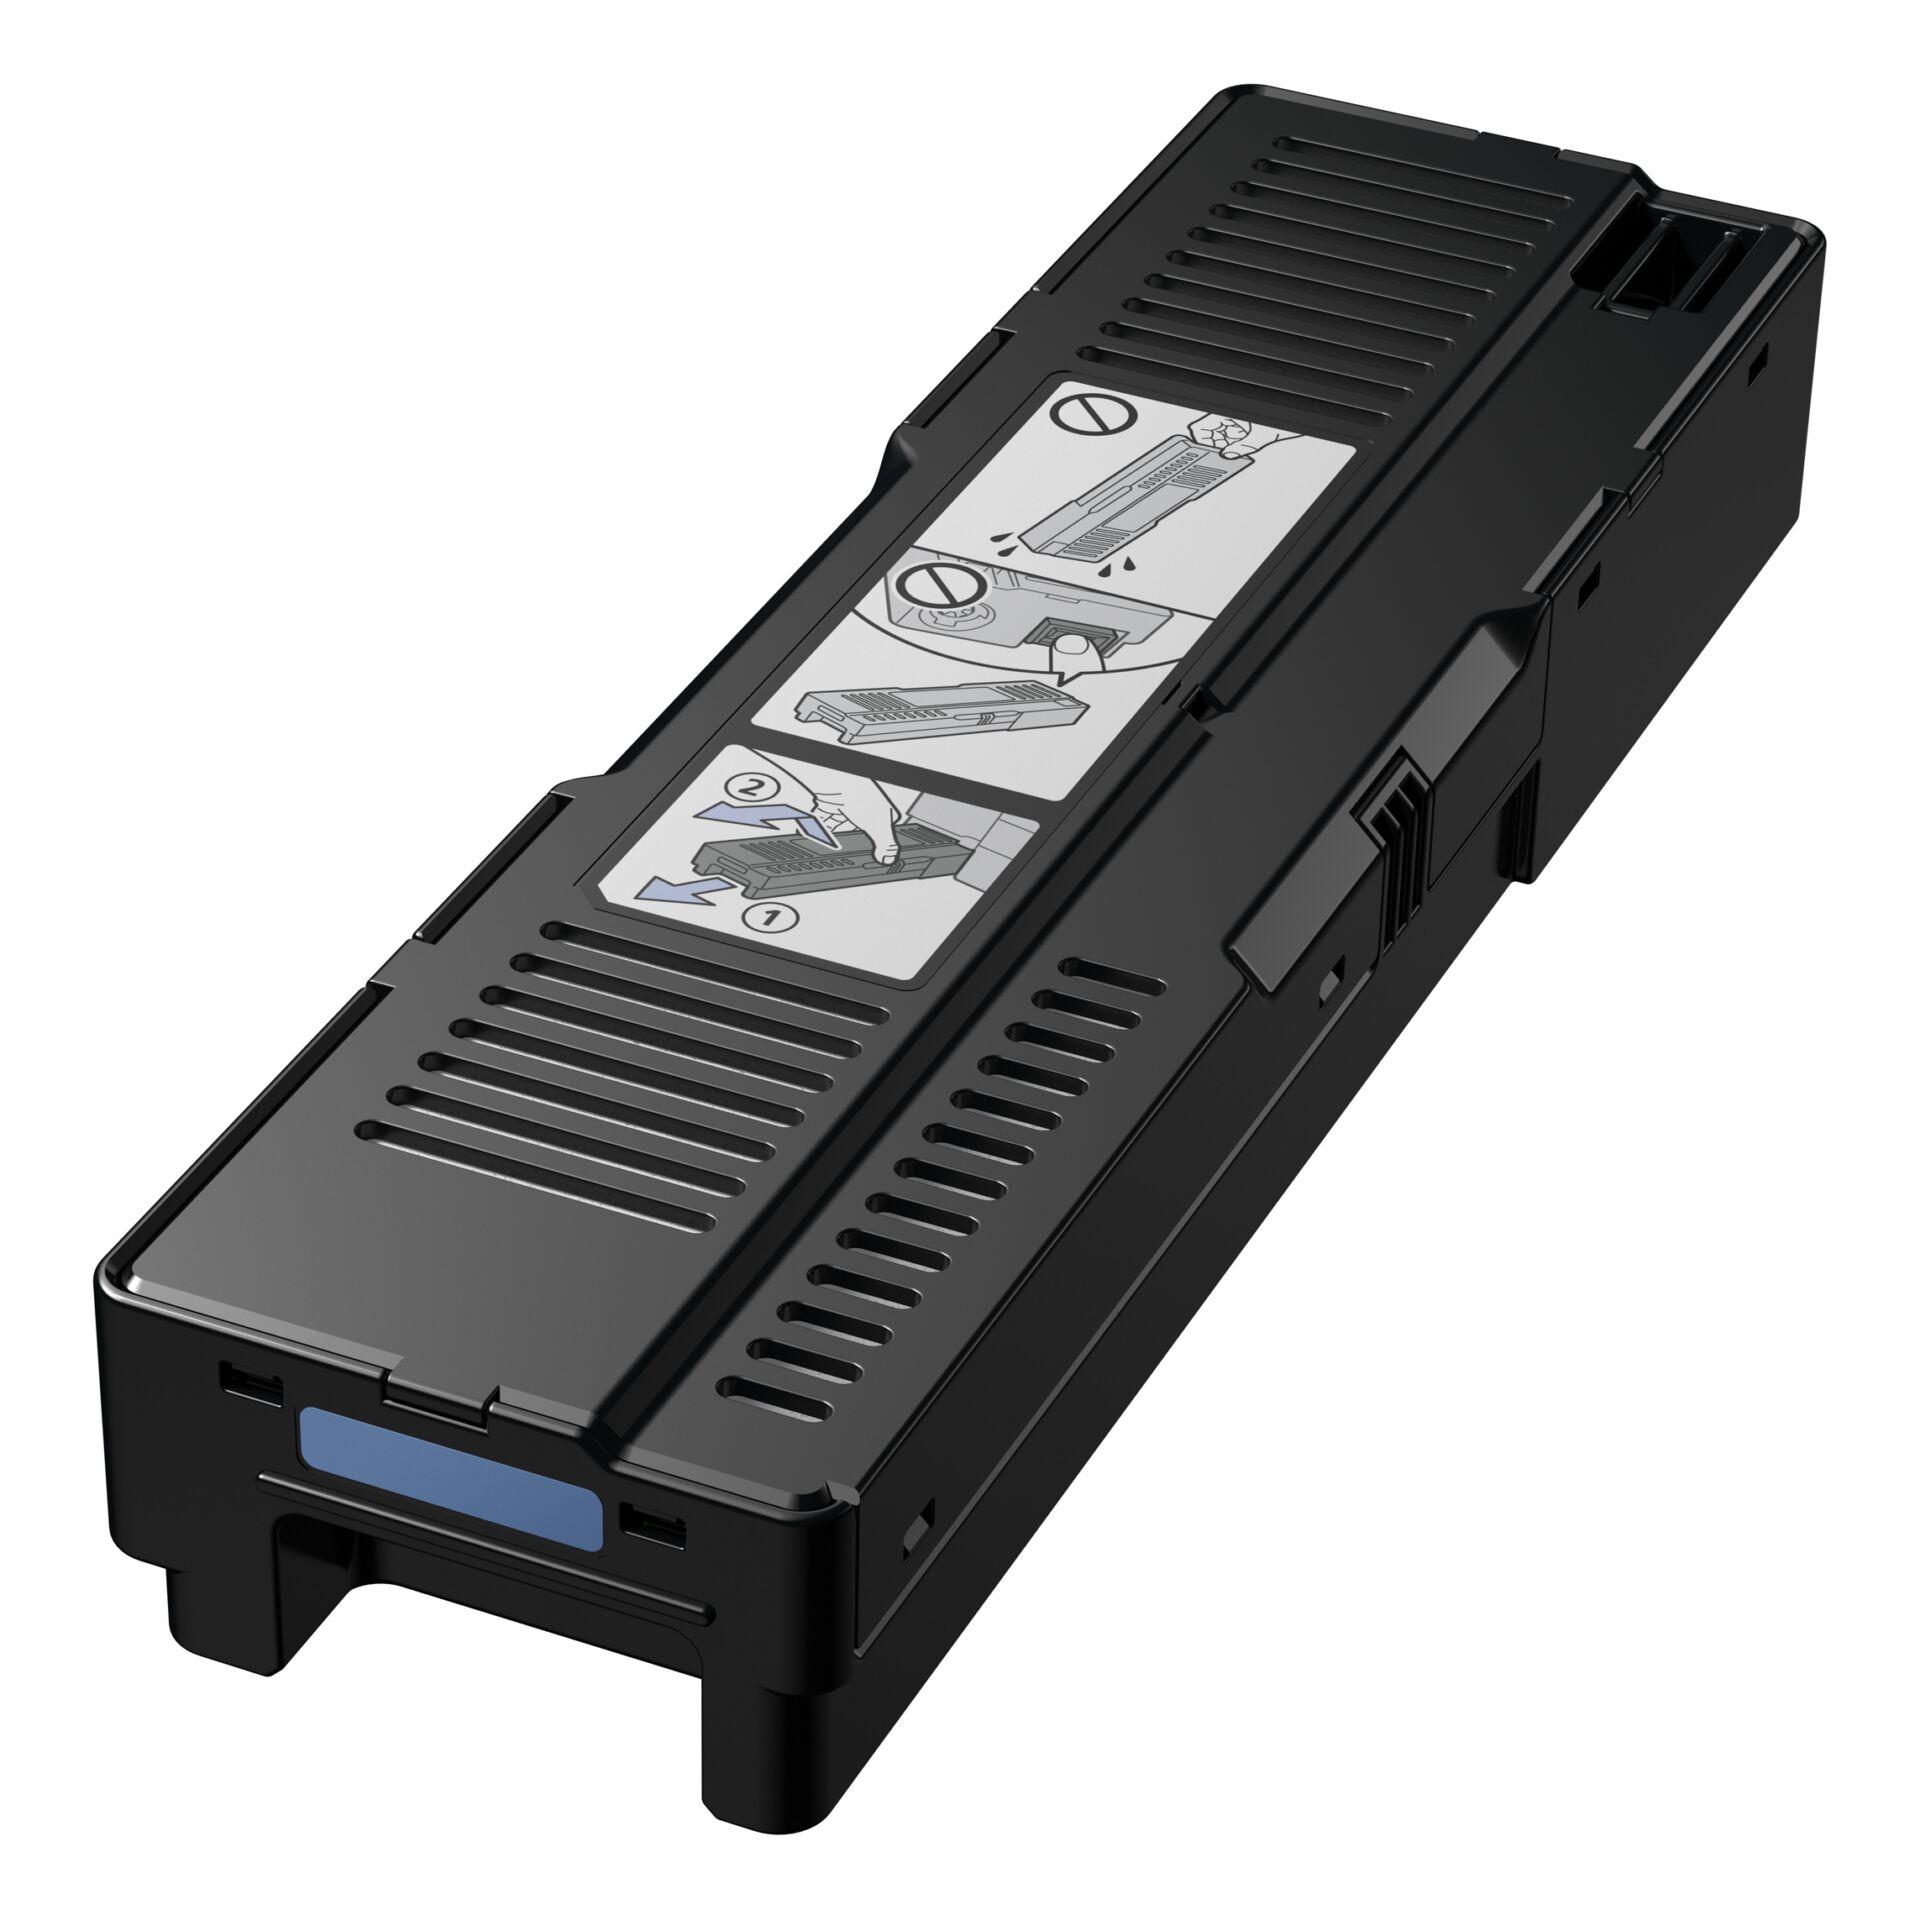 Canon MC-G 01 Maintenance Cartridge